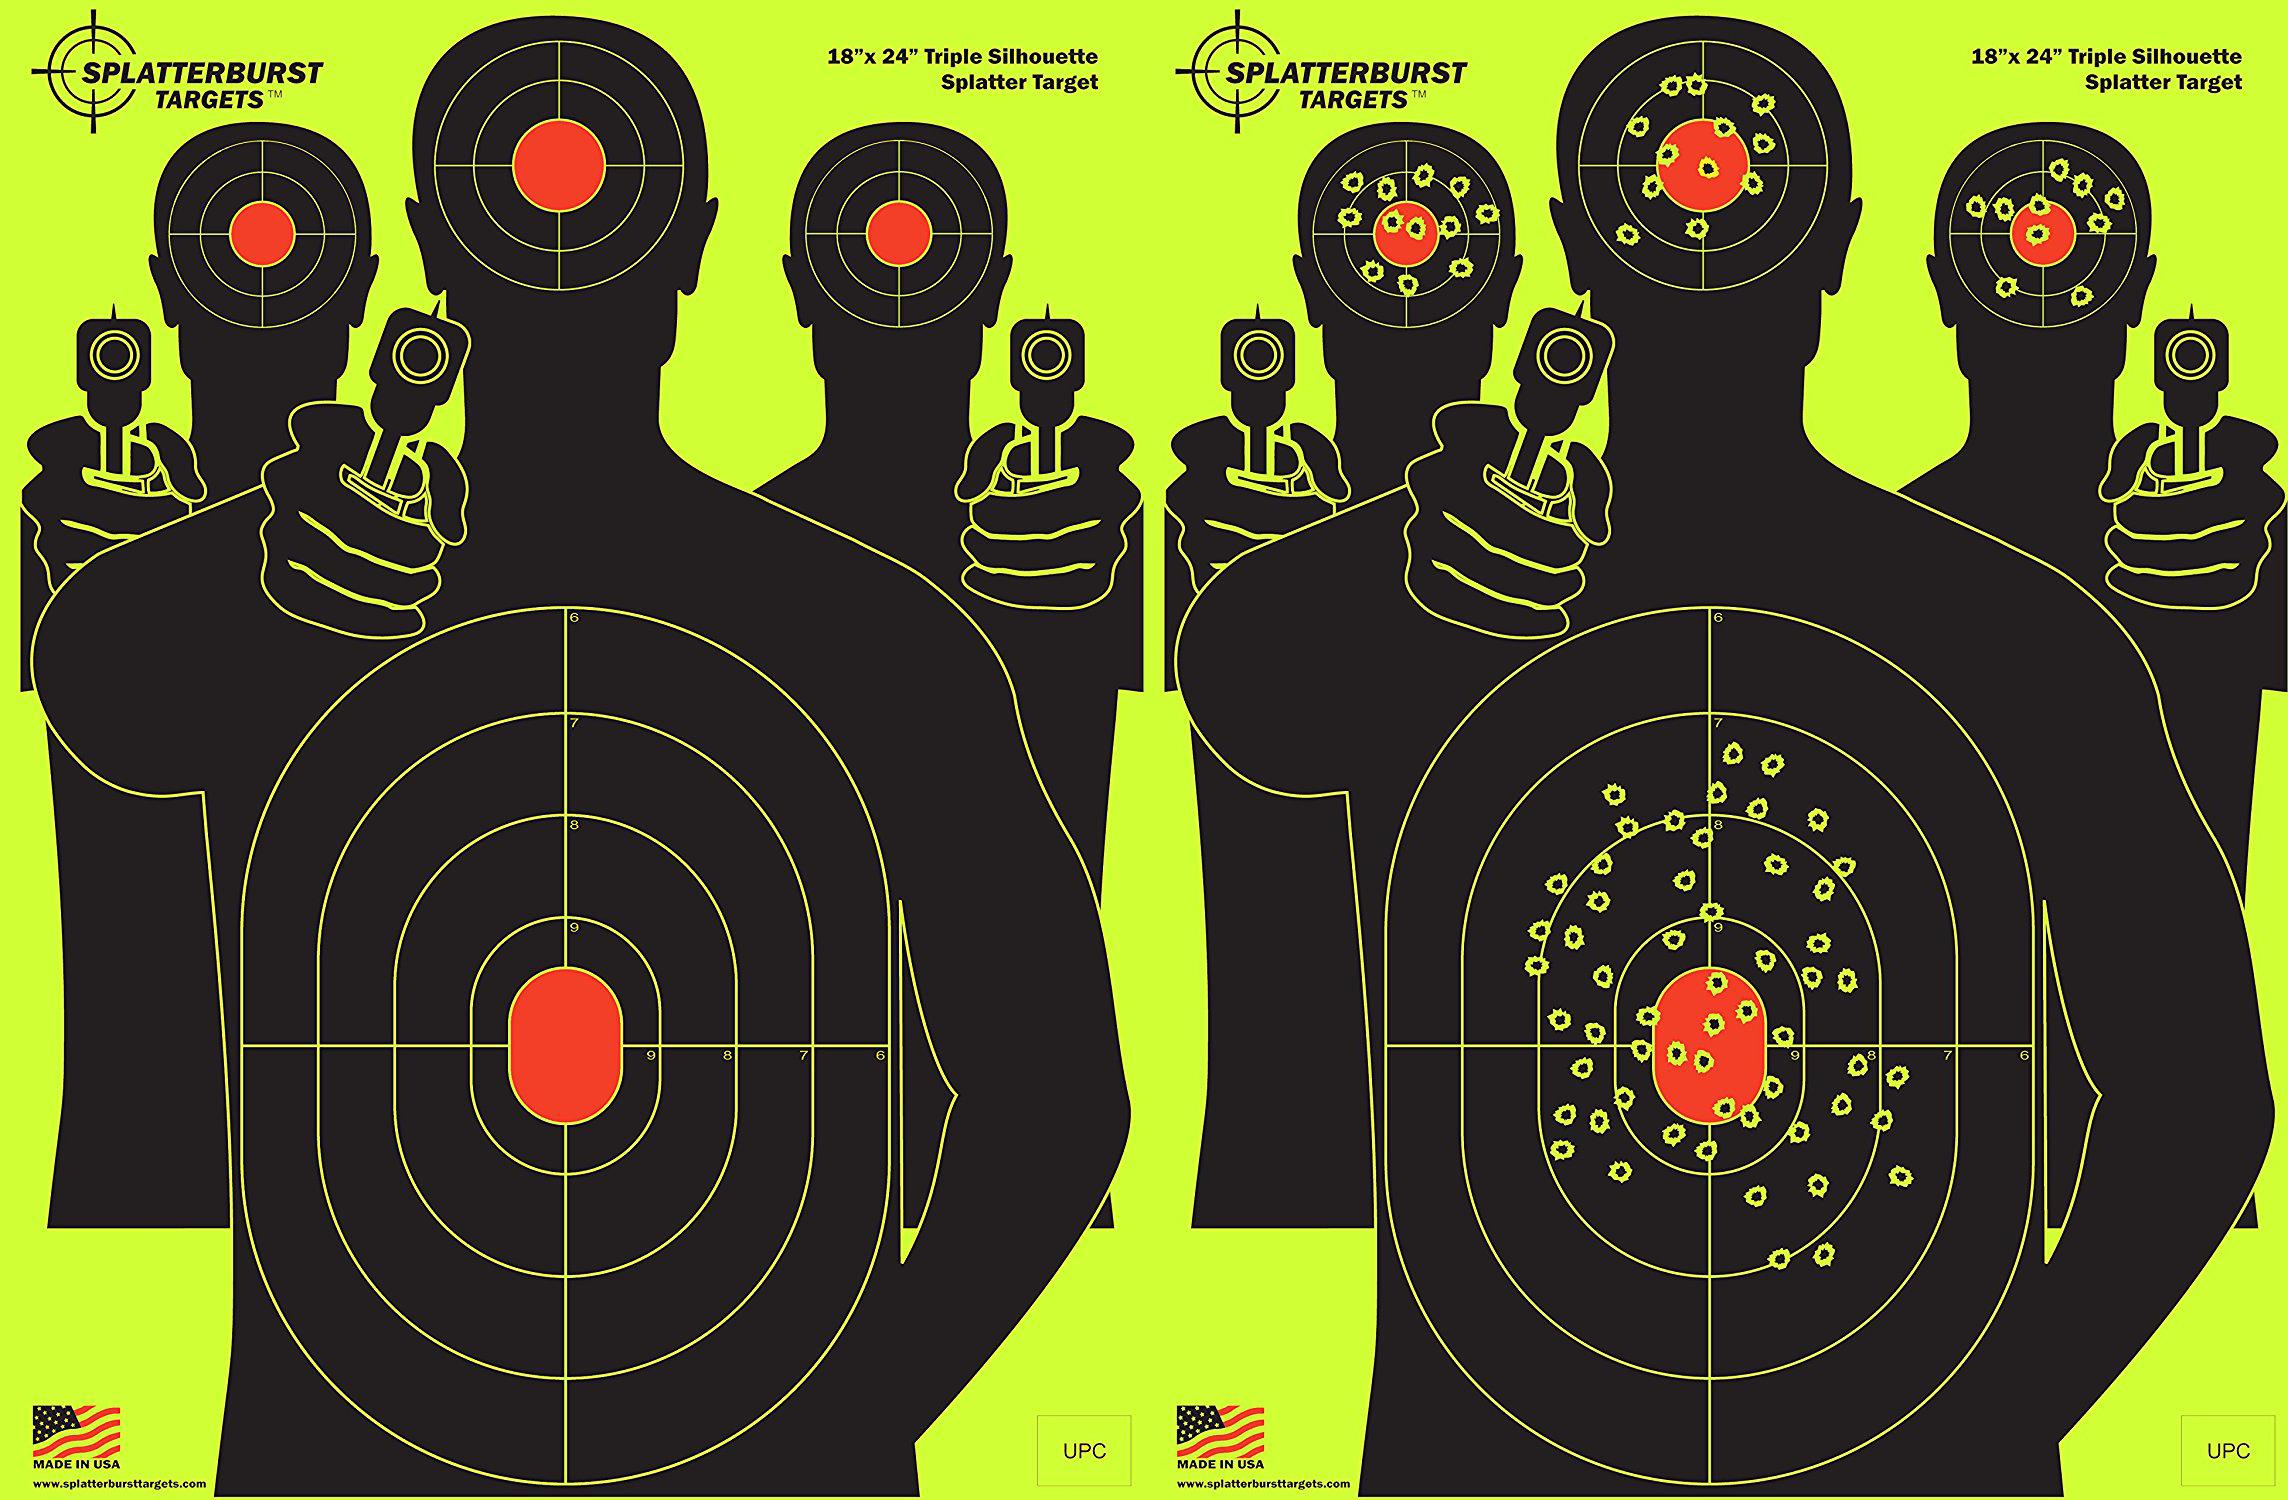 Splatterburst Targets - 18 x 24 inch - Triple Silhouette Reactive Shooting Target